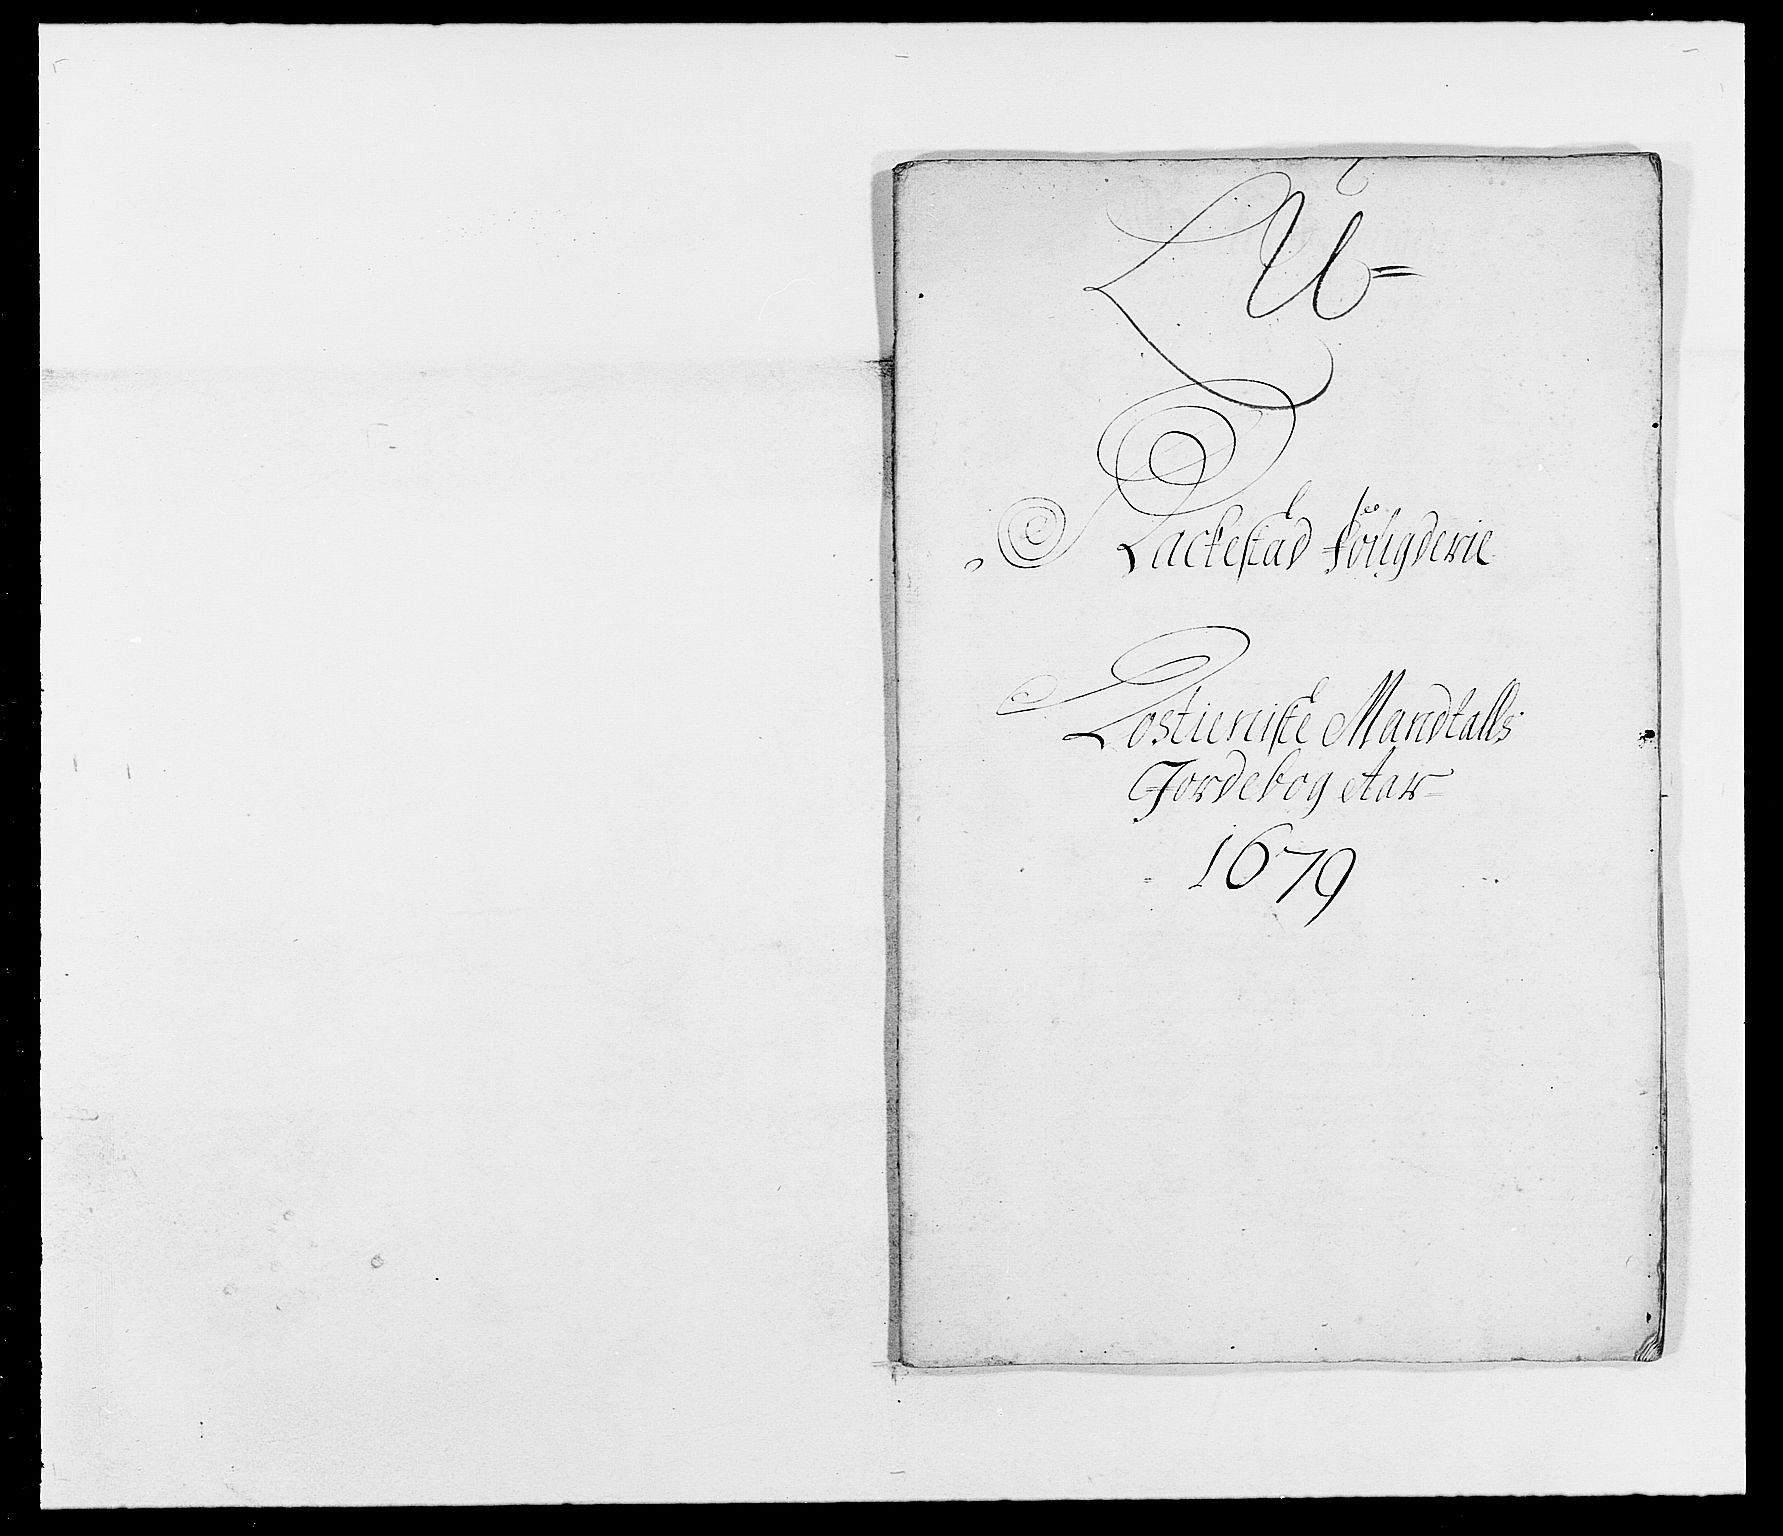 RA, Rentekammeret inntil 1814, Reviderte regnskaper, Fogderegnskap, R05/L0271: Fogderegnskap Rakkestad, 1678-1679, s. 453